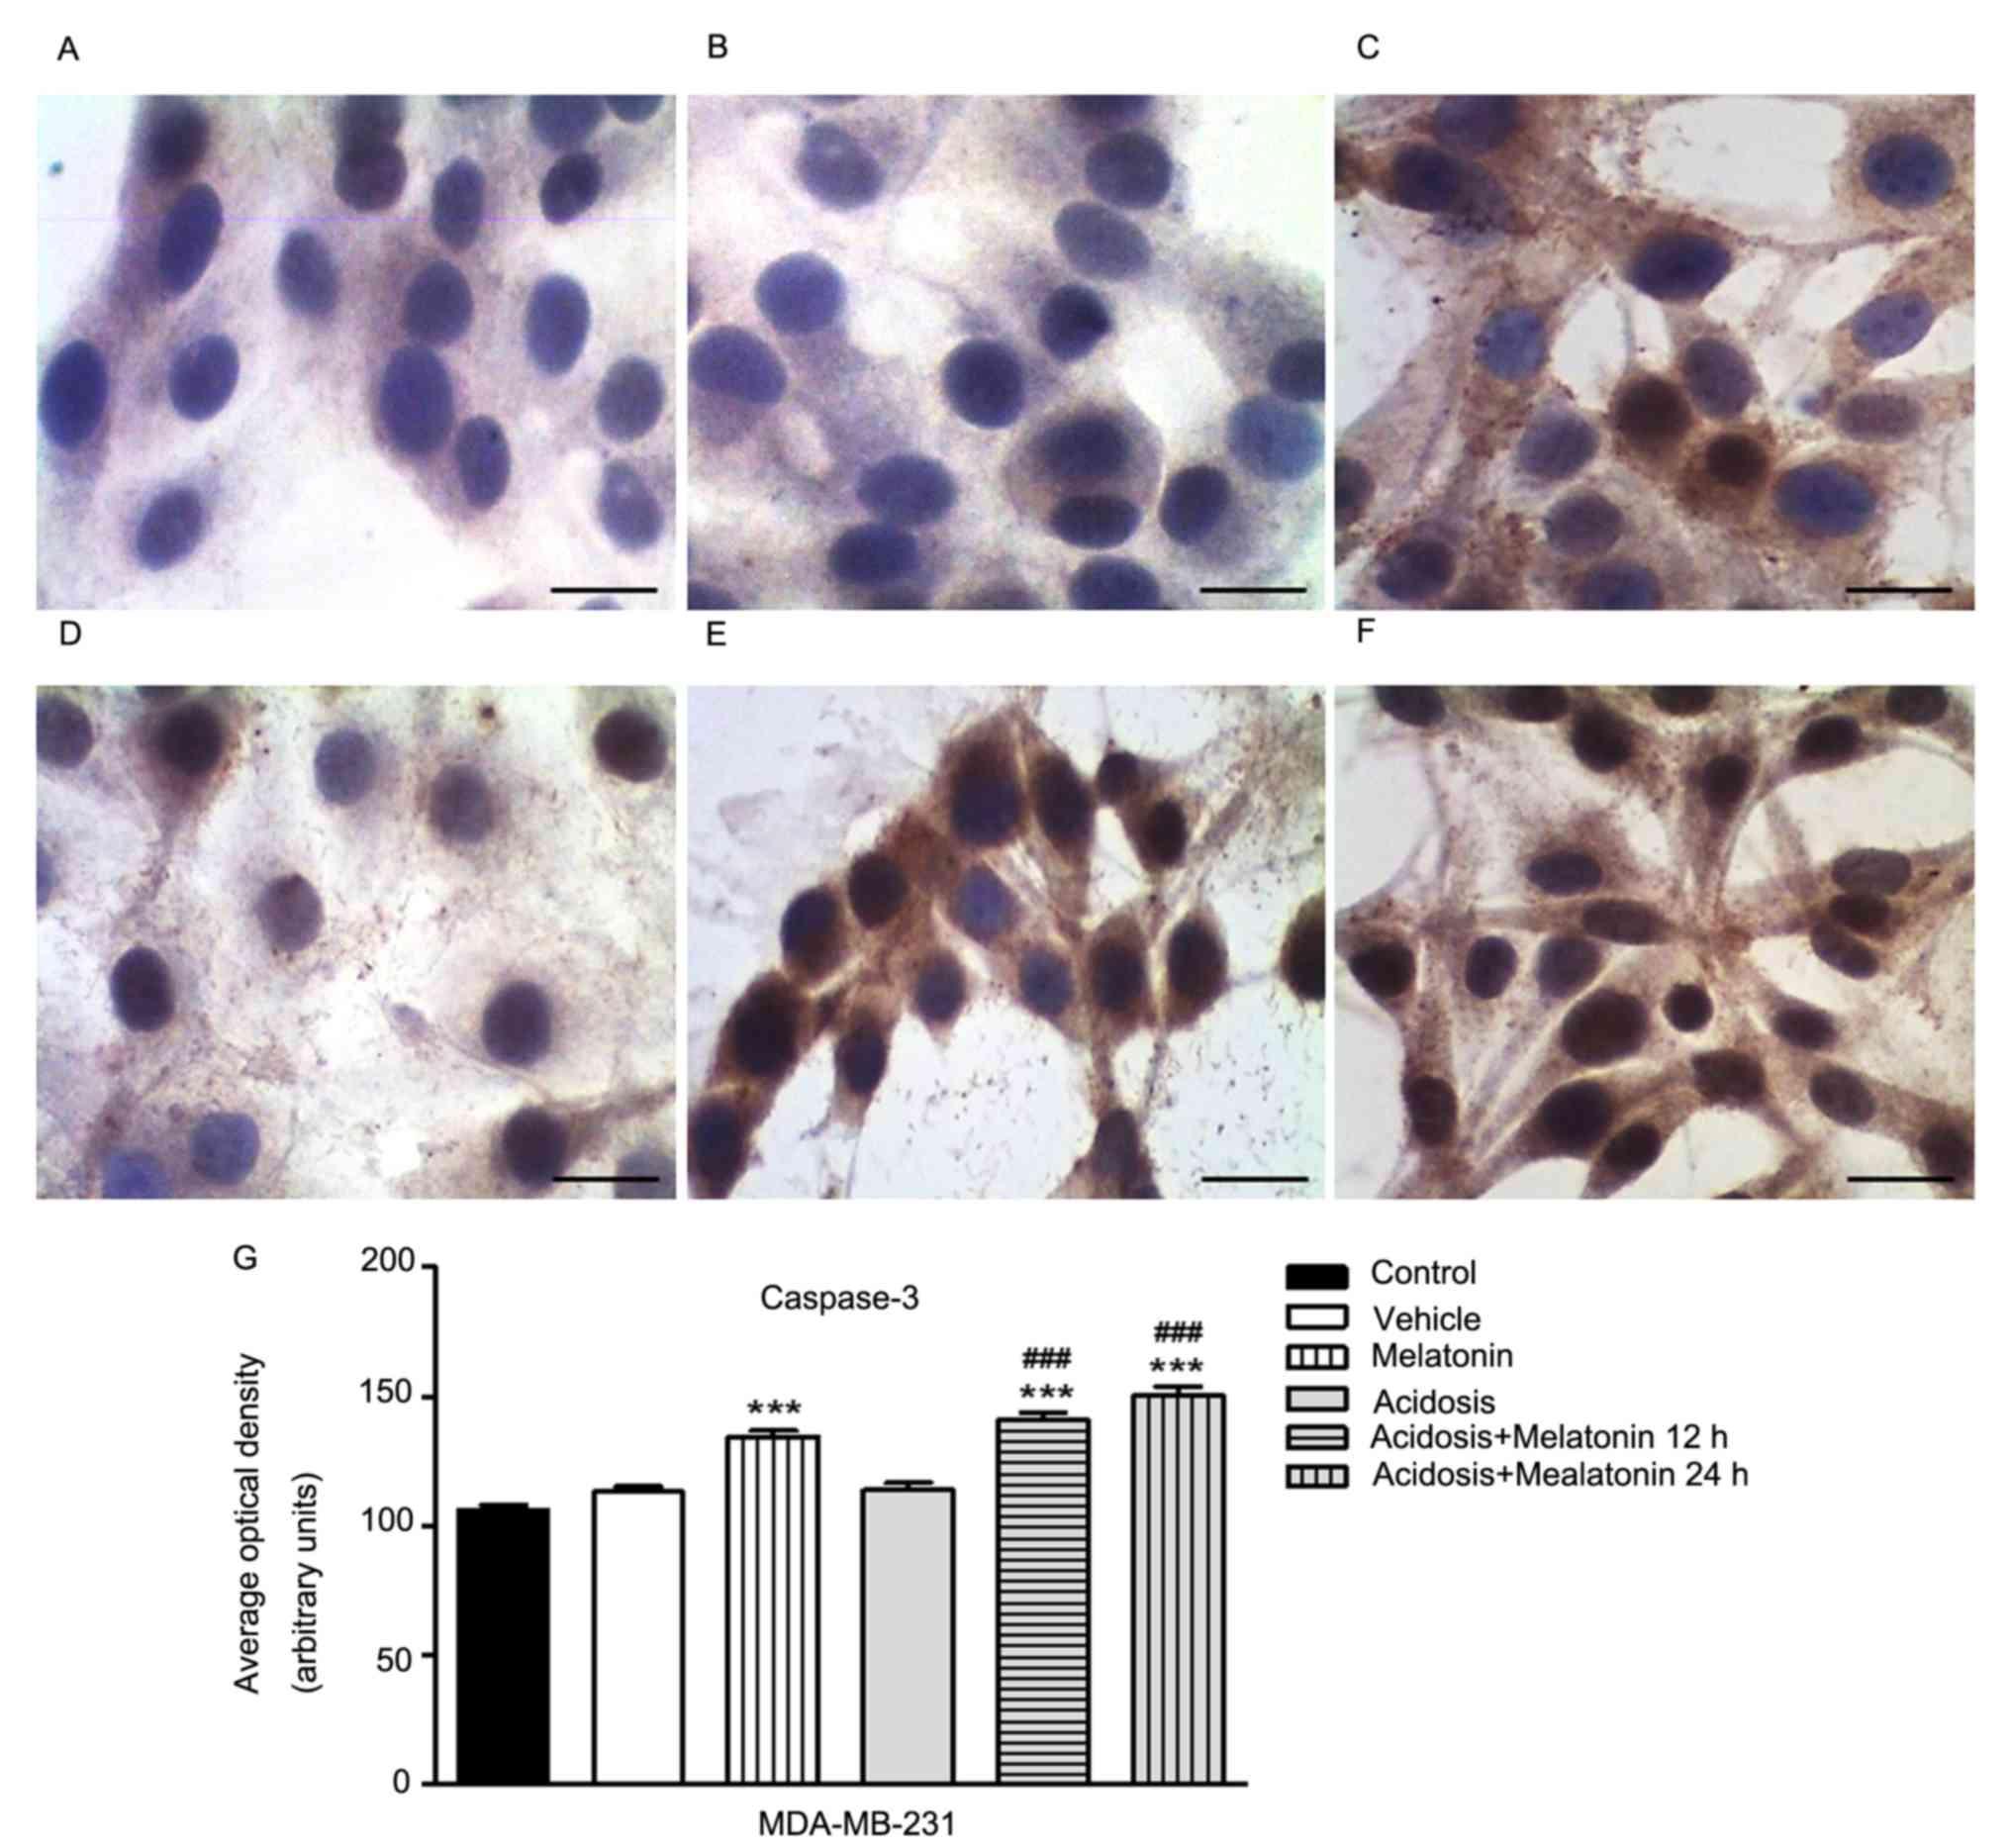 Melatonin regulates tumor aggressiveness under acidosis condition in